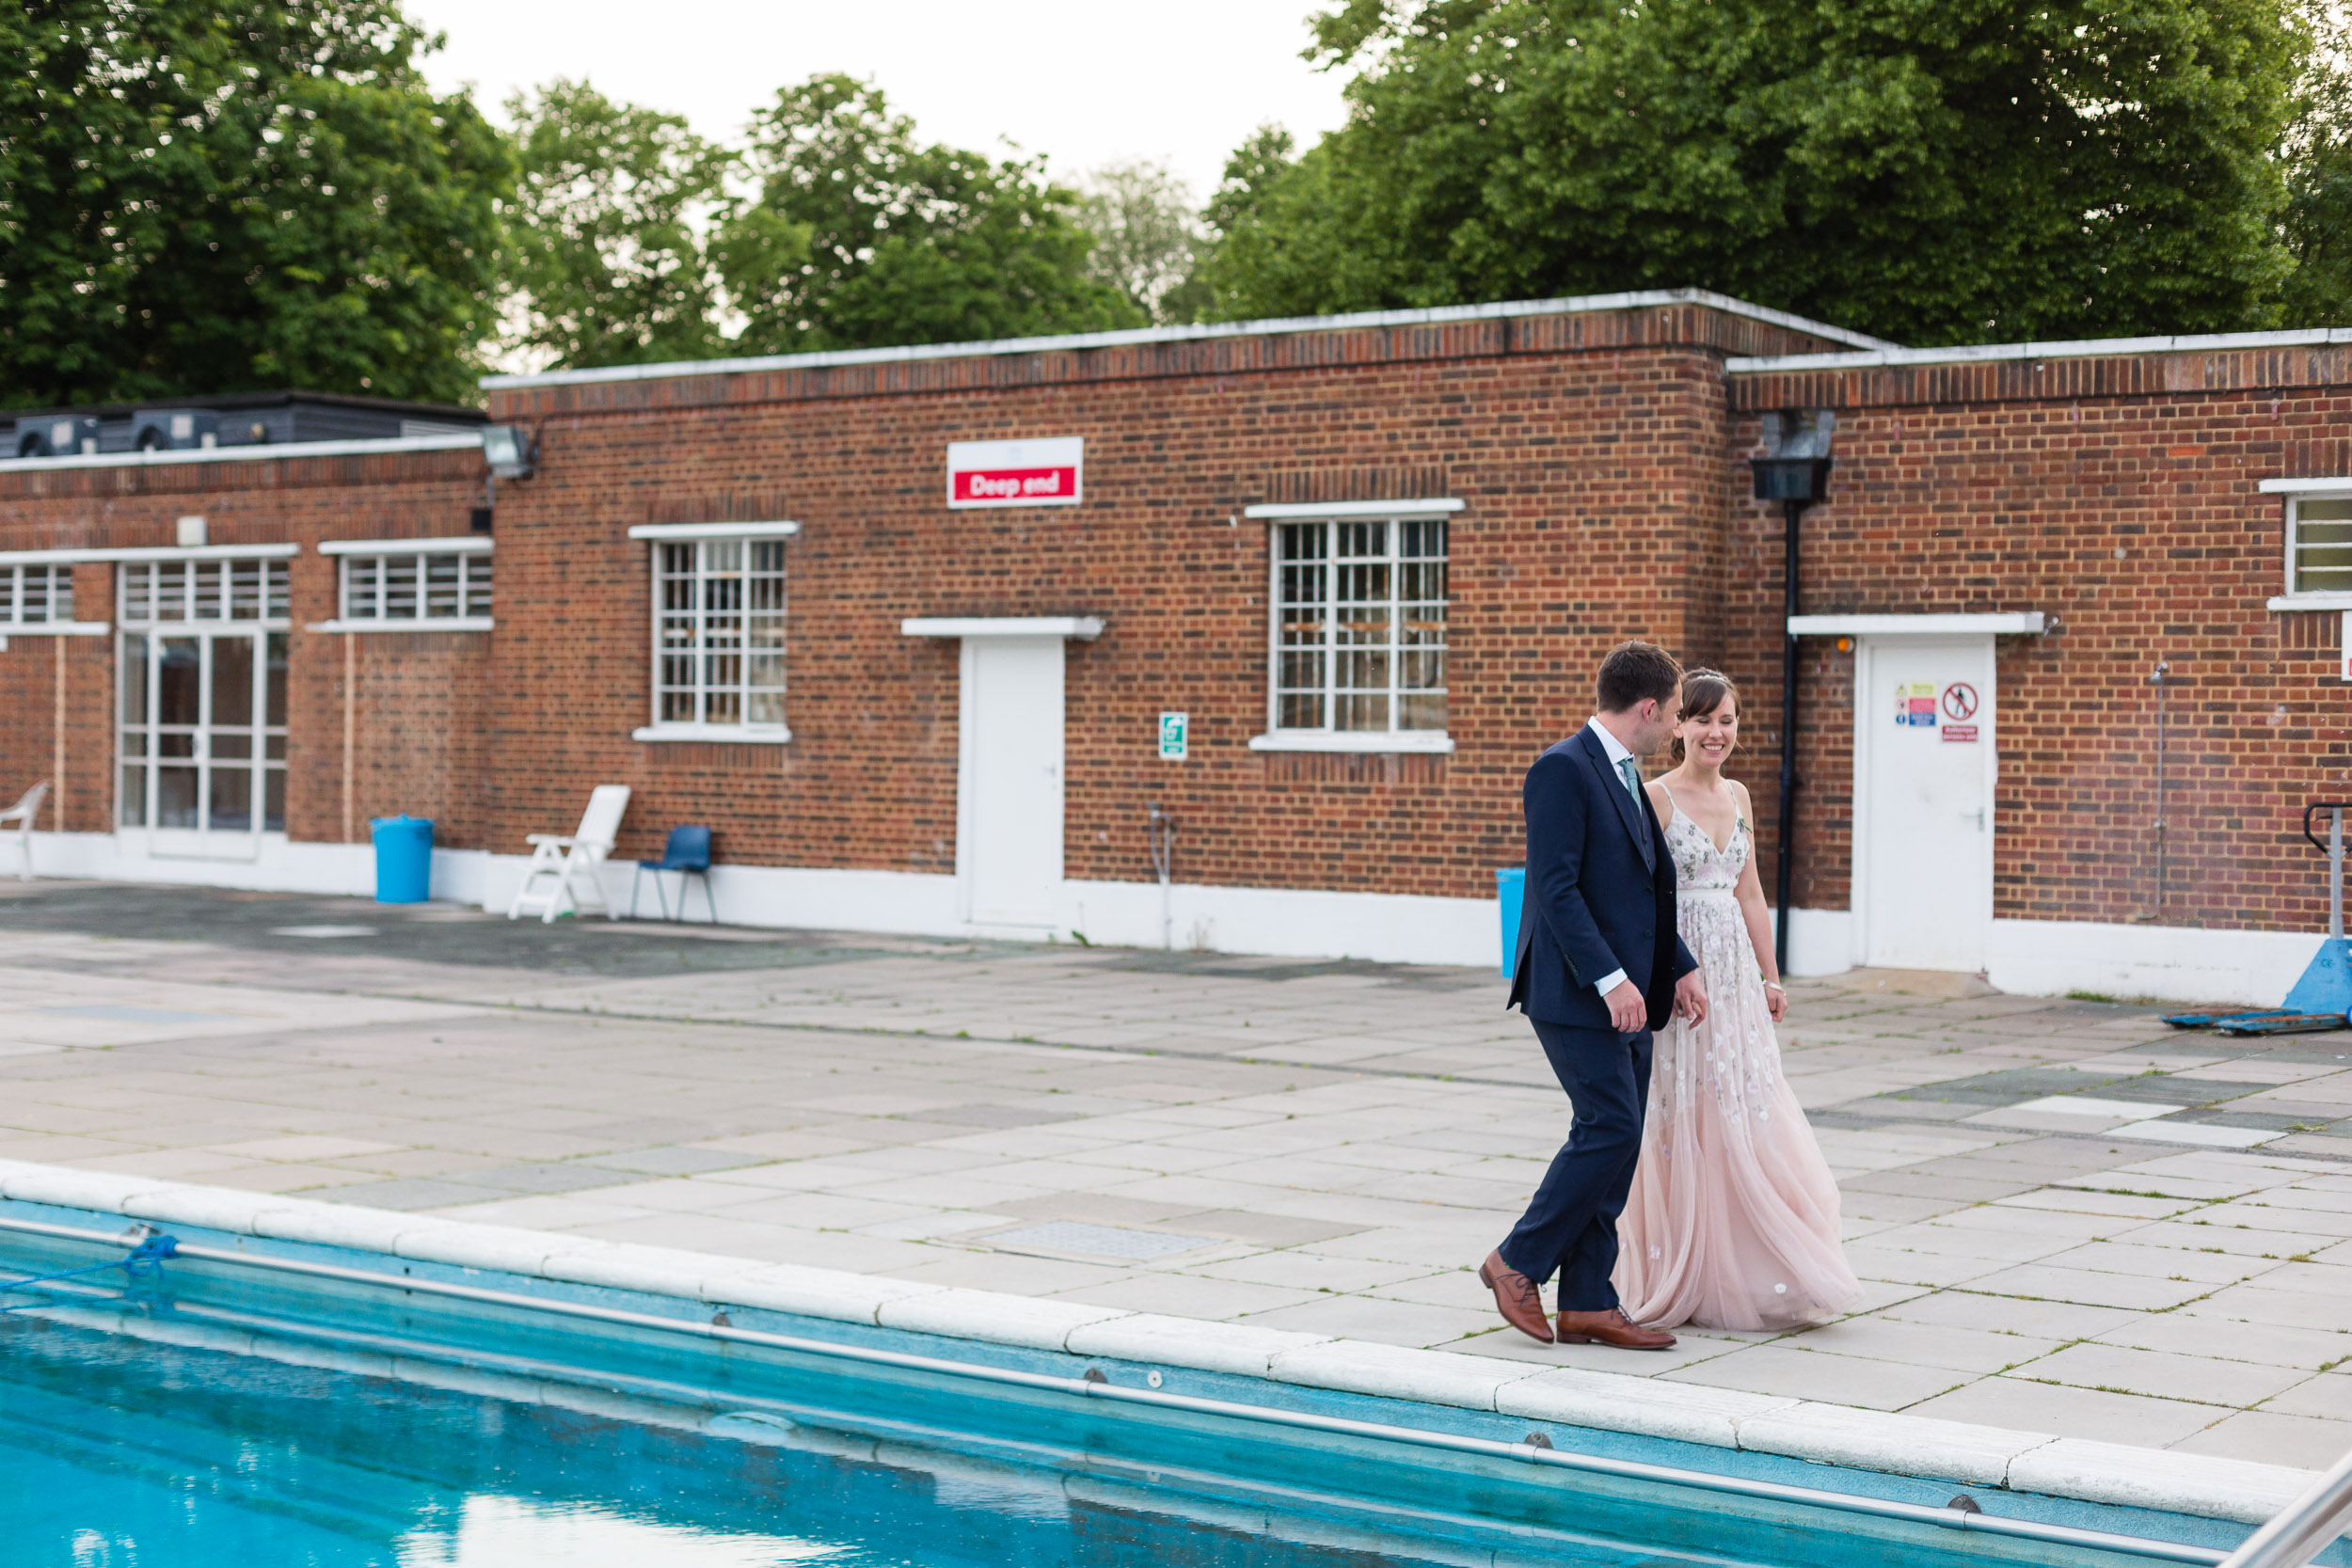 brockwell-lido-brixton-herne-hill-wedding-383.jpg